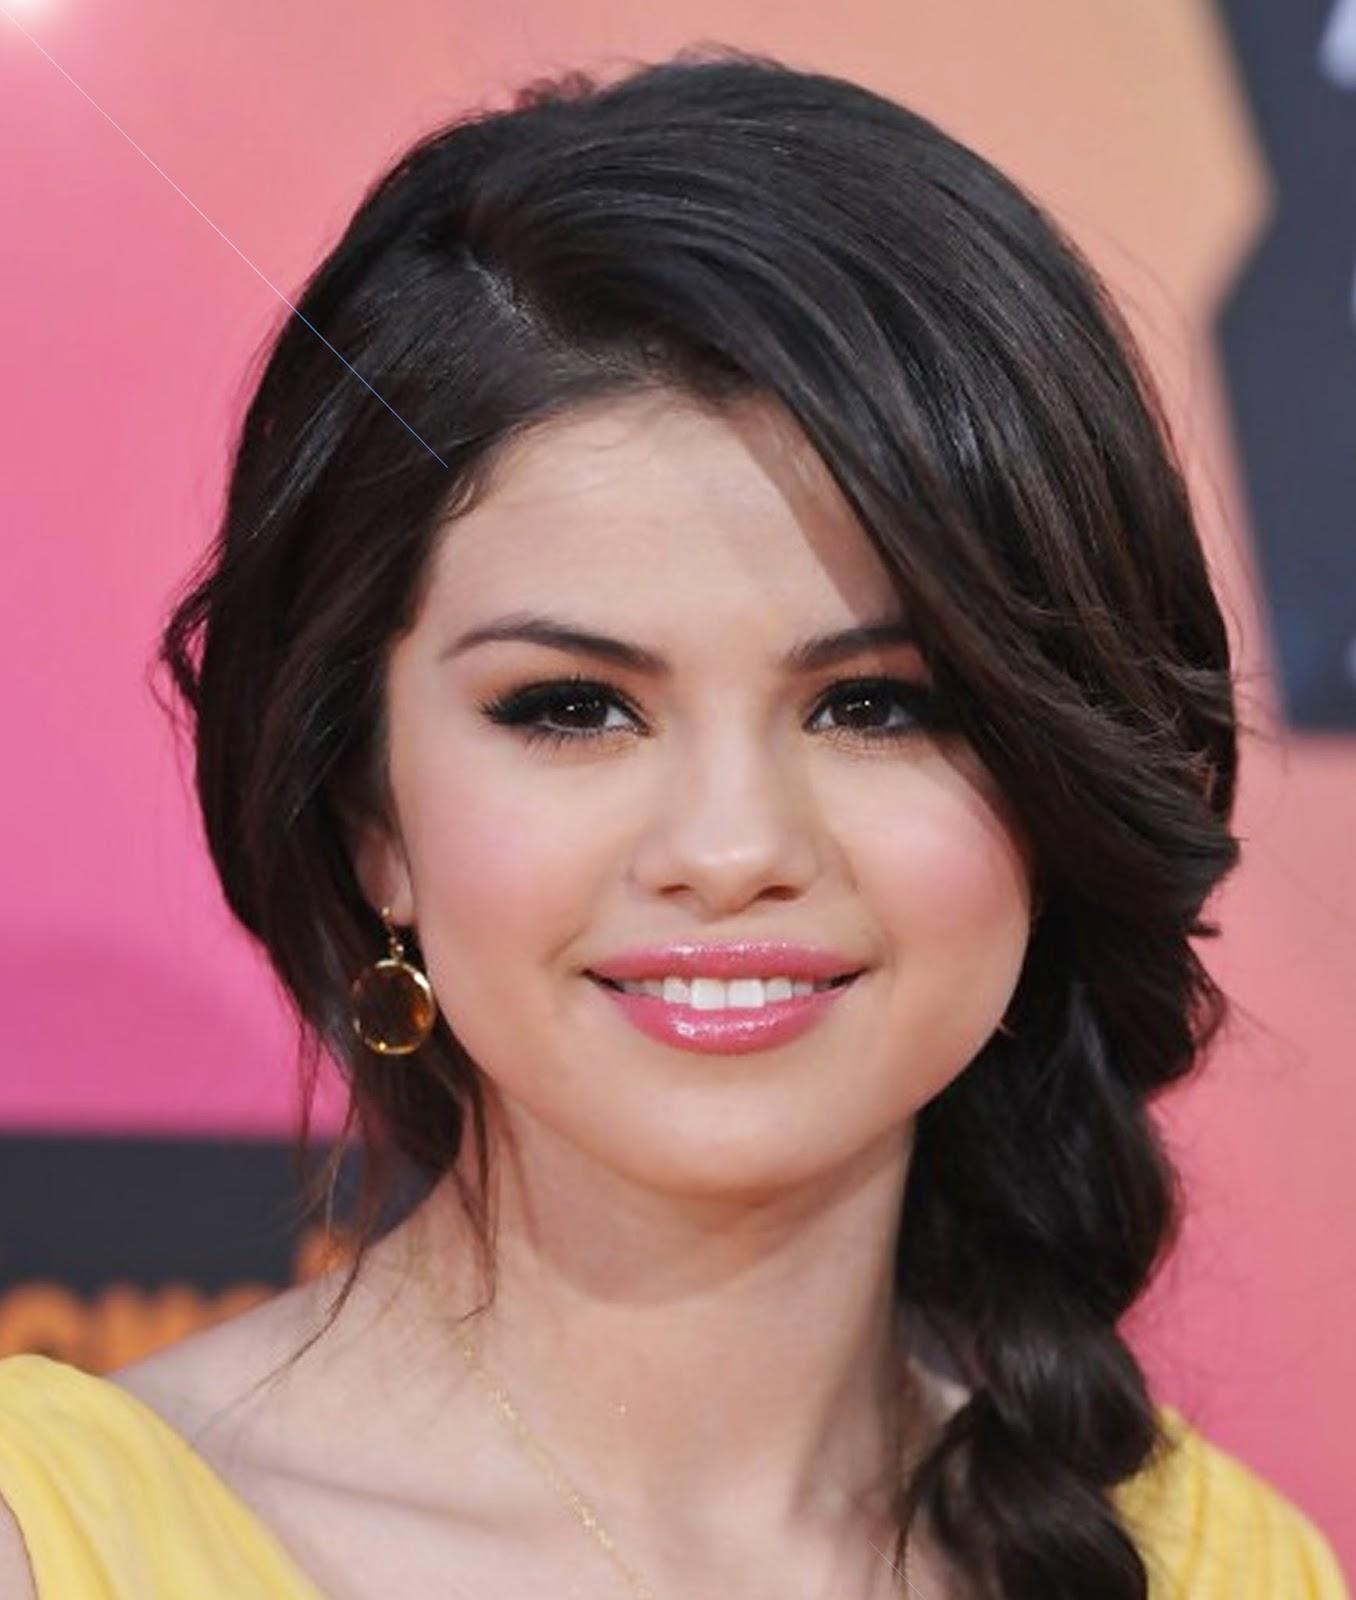 Selena Gomez Hairstyles Inspriration Hairstyles Spot